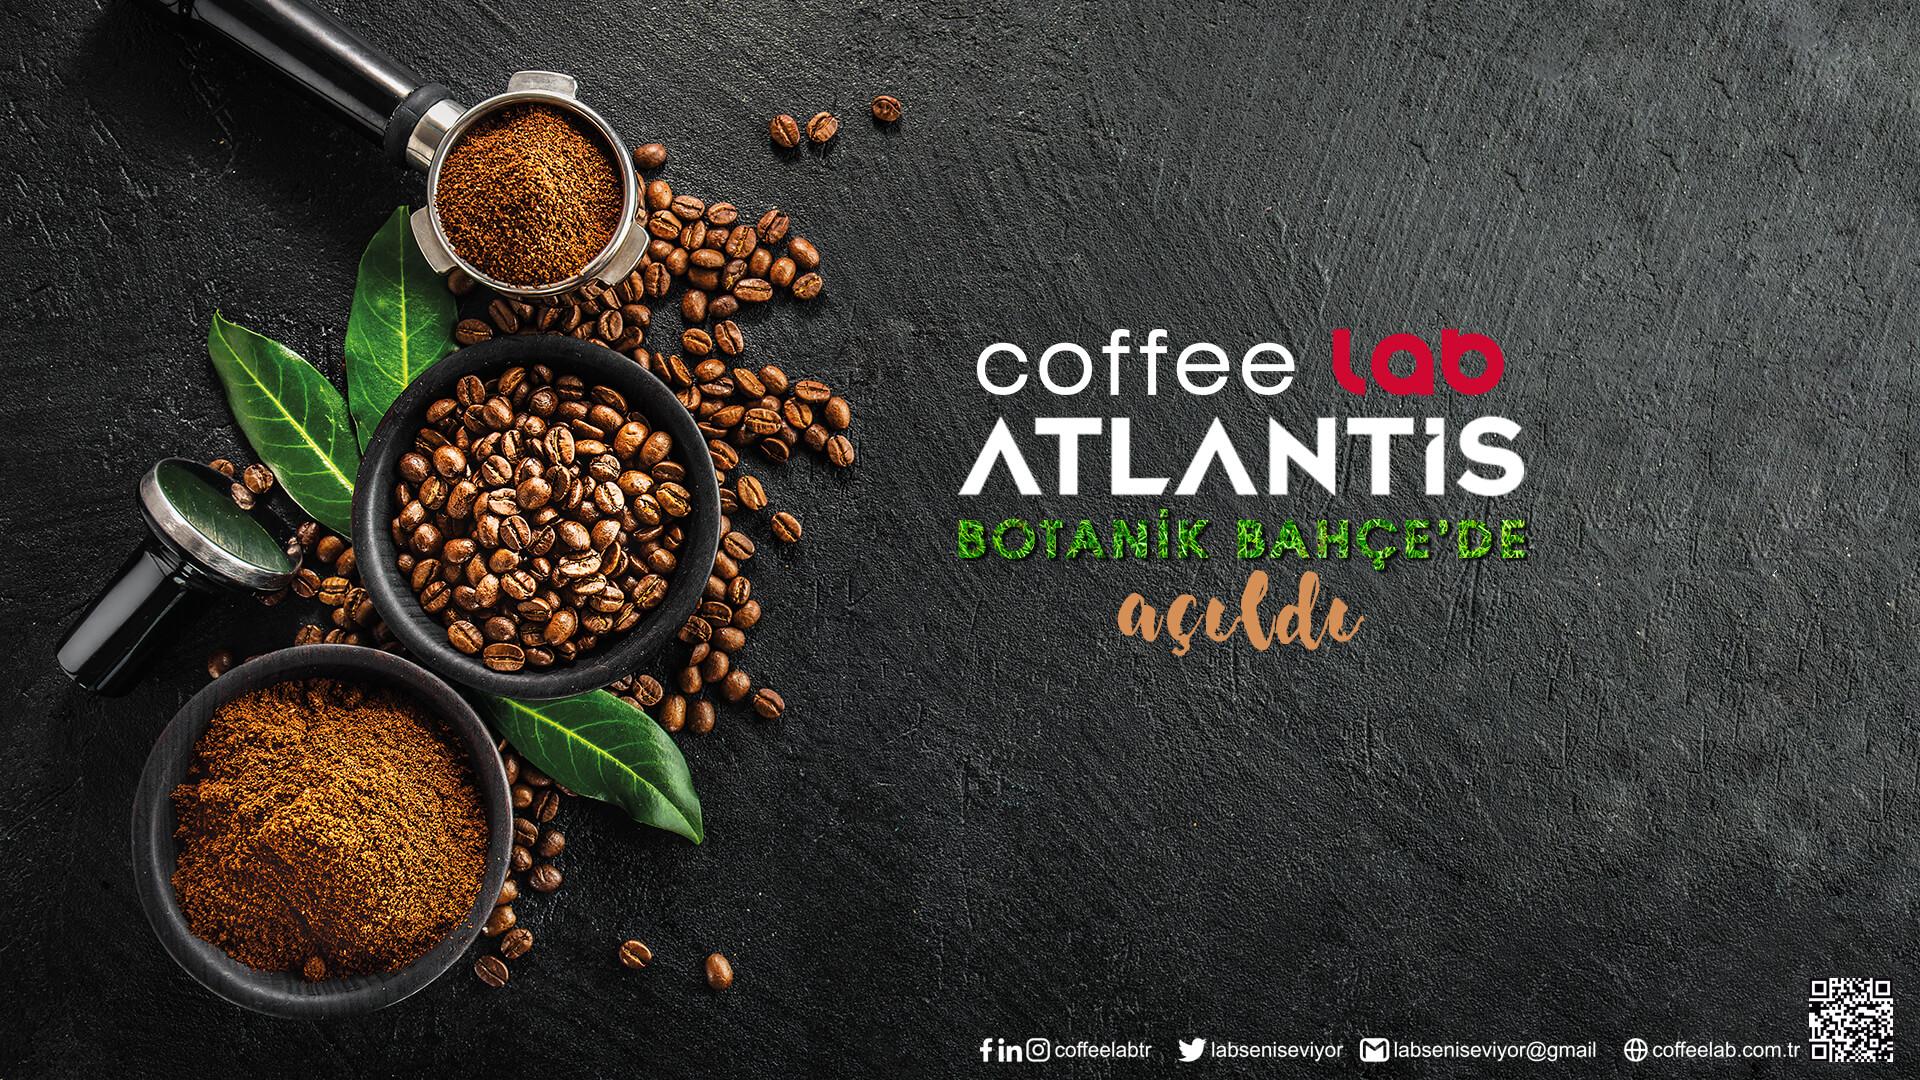 Coffee Lab Atlantis